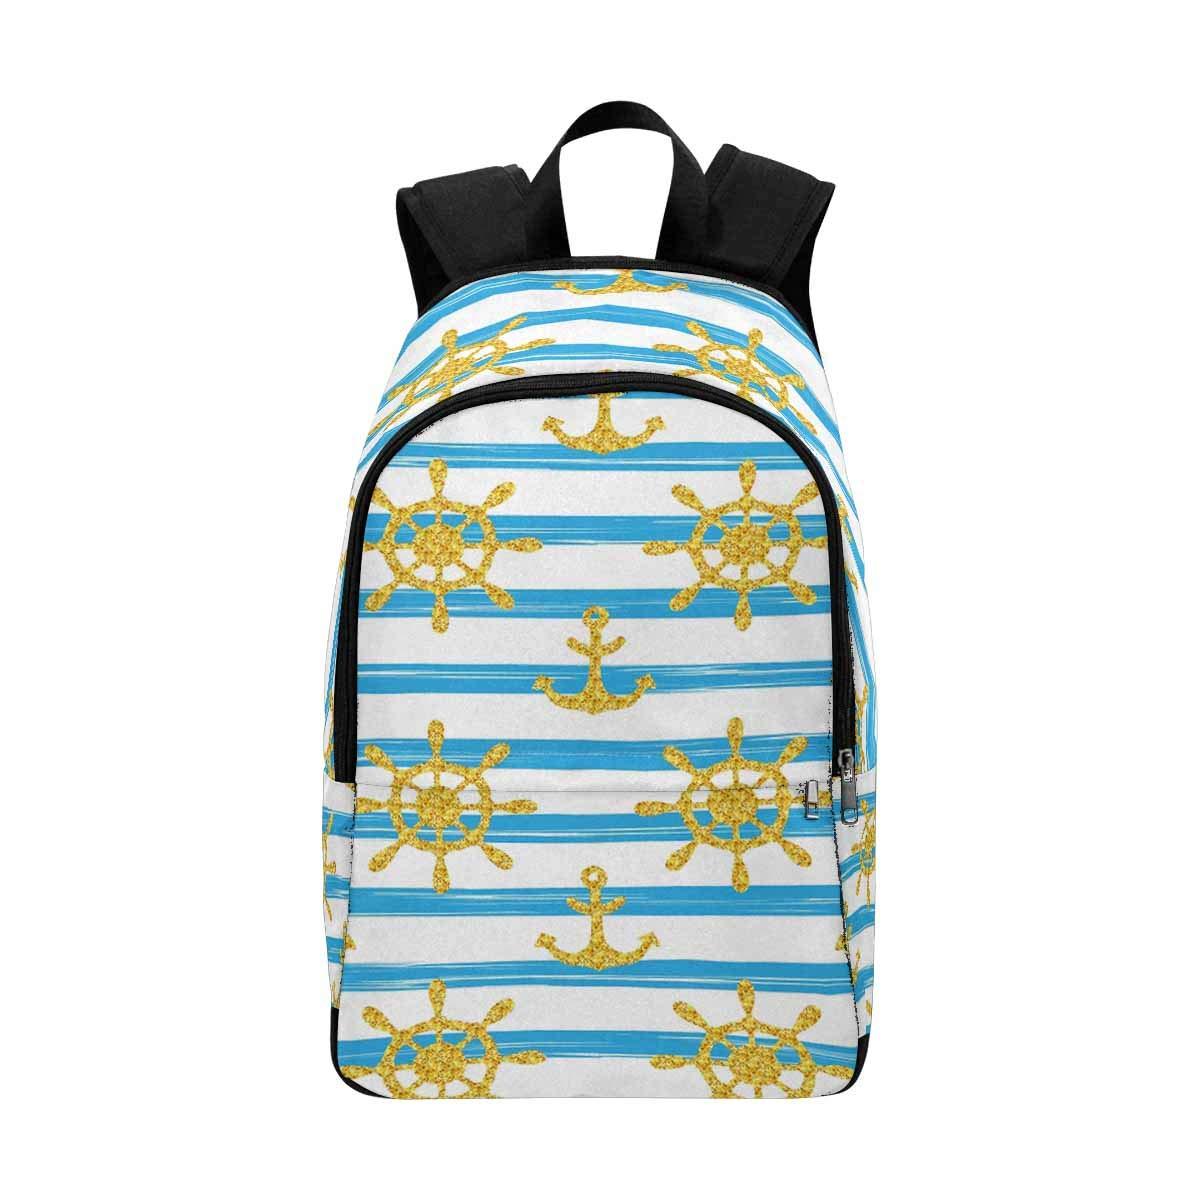 InterestPrint APPAREL ボーイズ US サイズ: backpack   B07G816X4Y